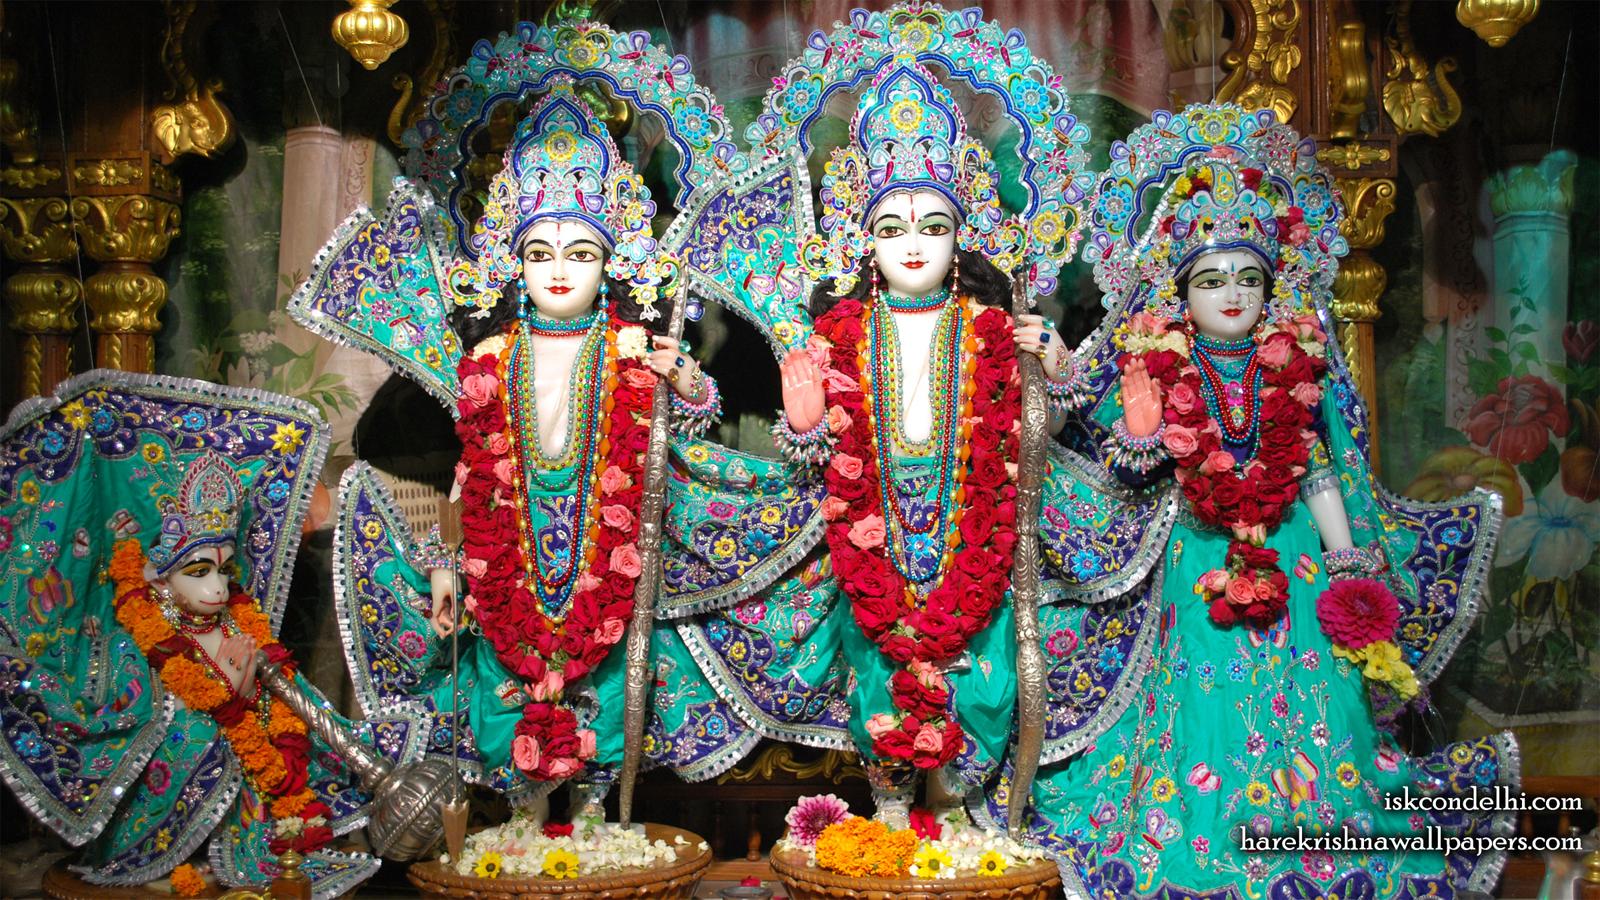 Sri Sri Sita Rama Laxman Hanuman Wallpaper (019) Size 1600x900 Download